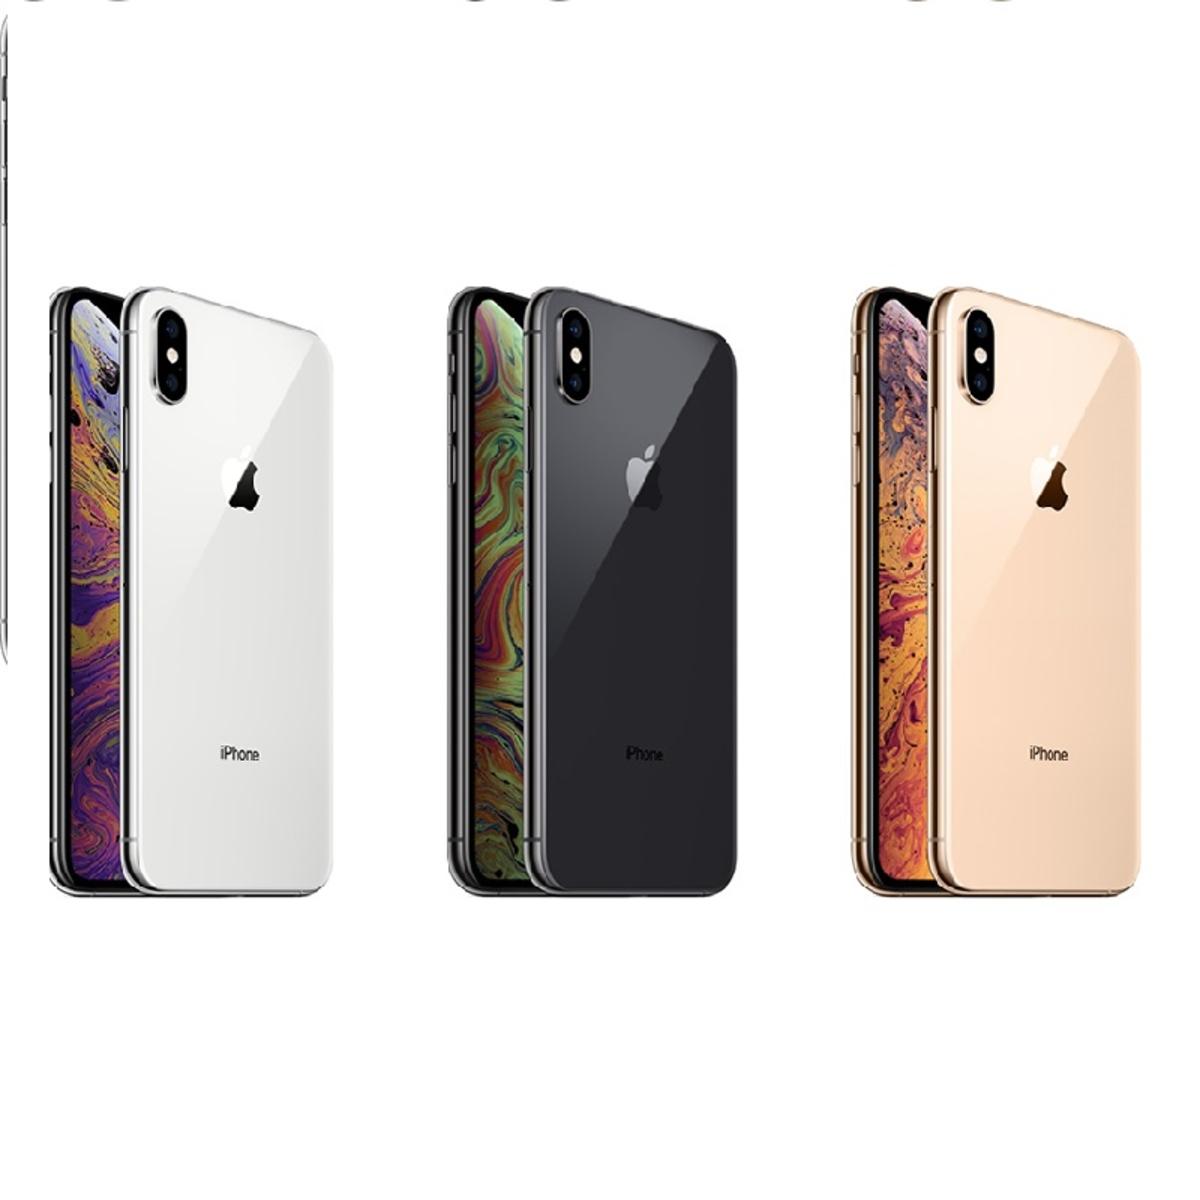 apple iphone xs 64gb mobile phone apple iphone xs 64gb mobile phone Apple iPhone XS 64GB Mobile Phone Apple iPhone XS 64GB Mobile Phone